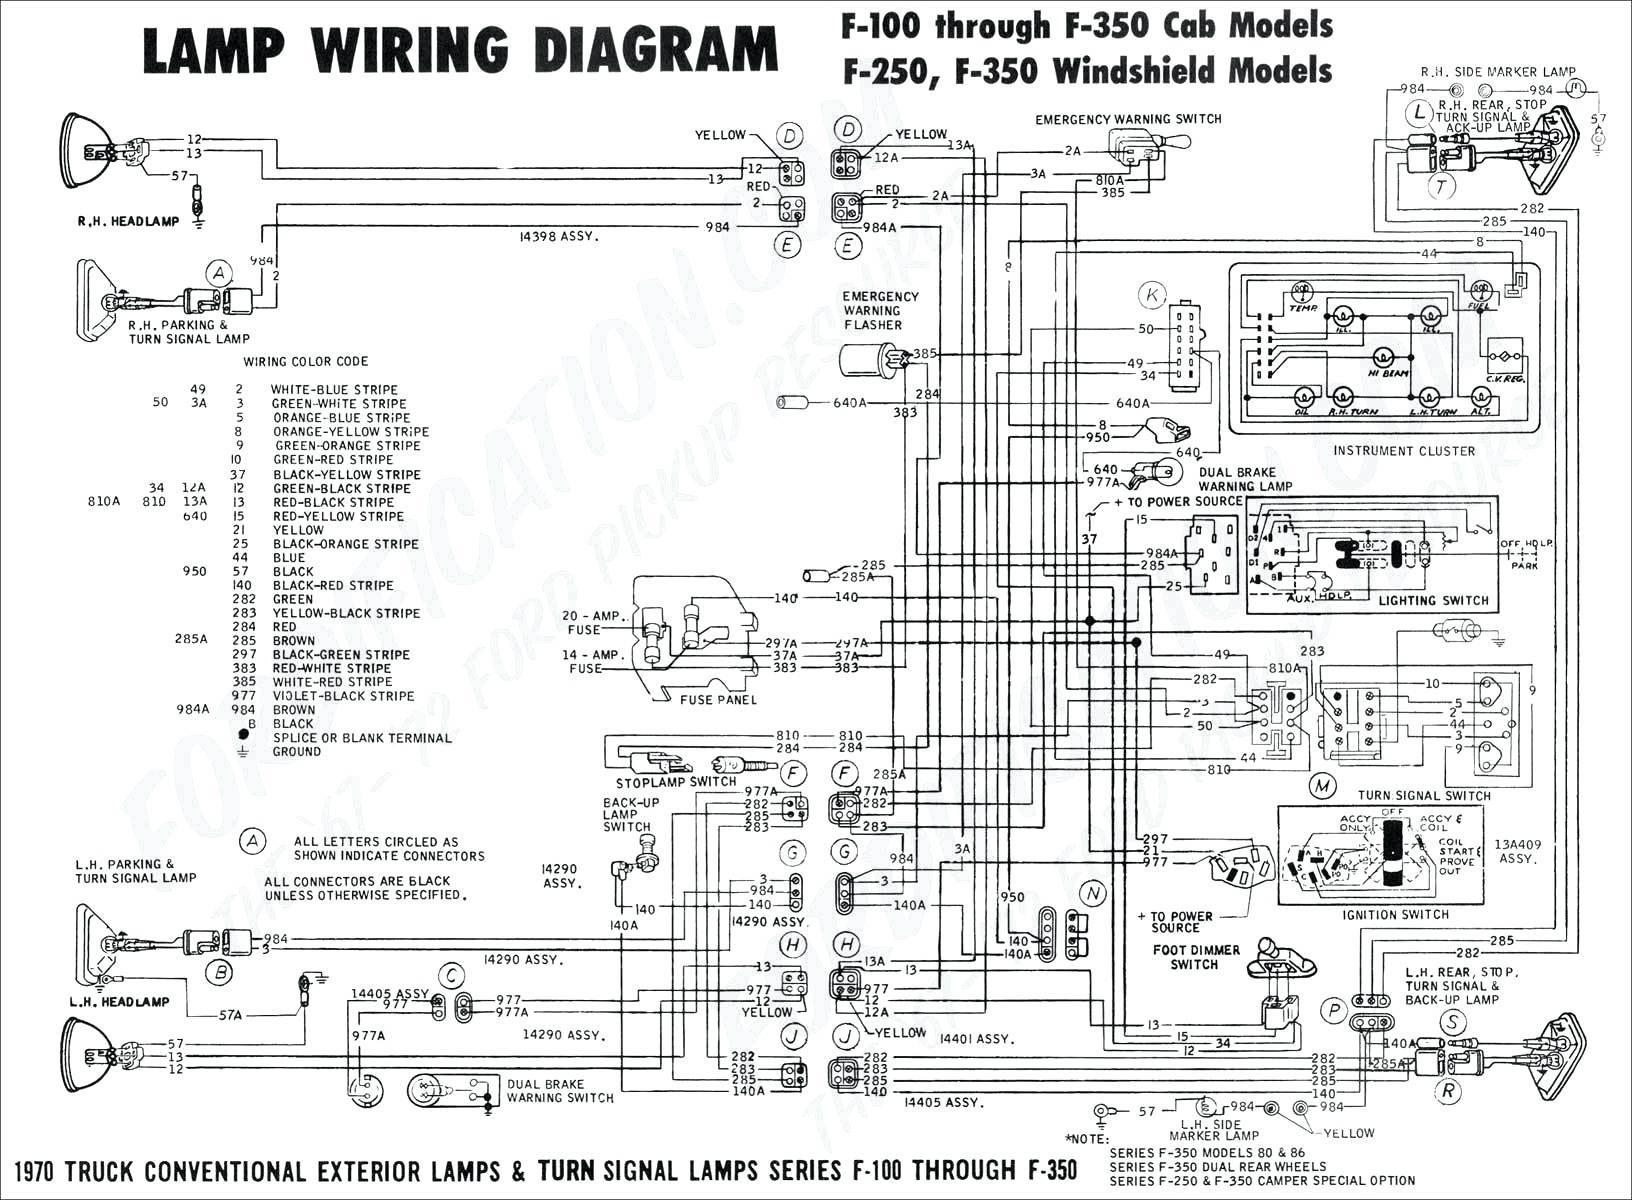 Dirt Bike Engine Diagram ford 5 4 Wiring Diagram Layout Wiring Diagrams • Of Dirt Bike Engine Diagram